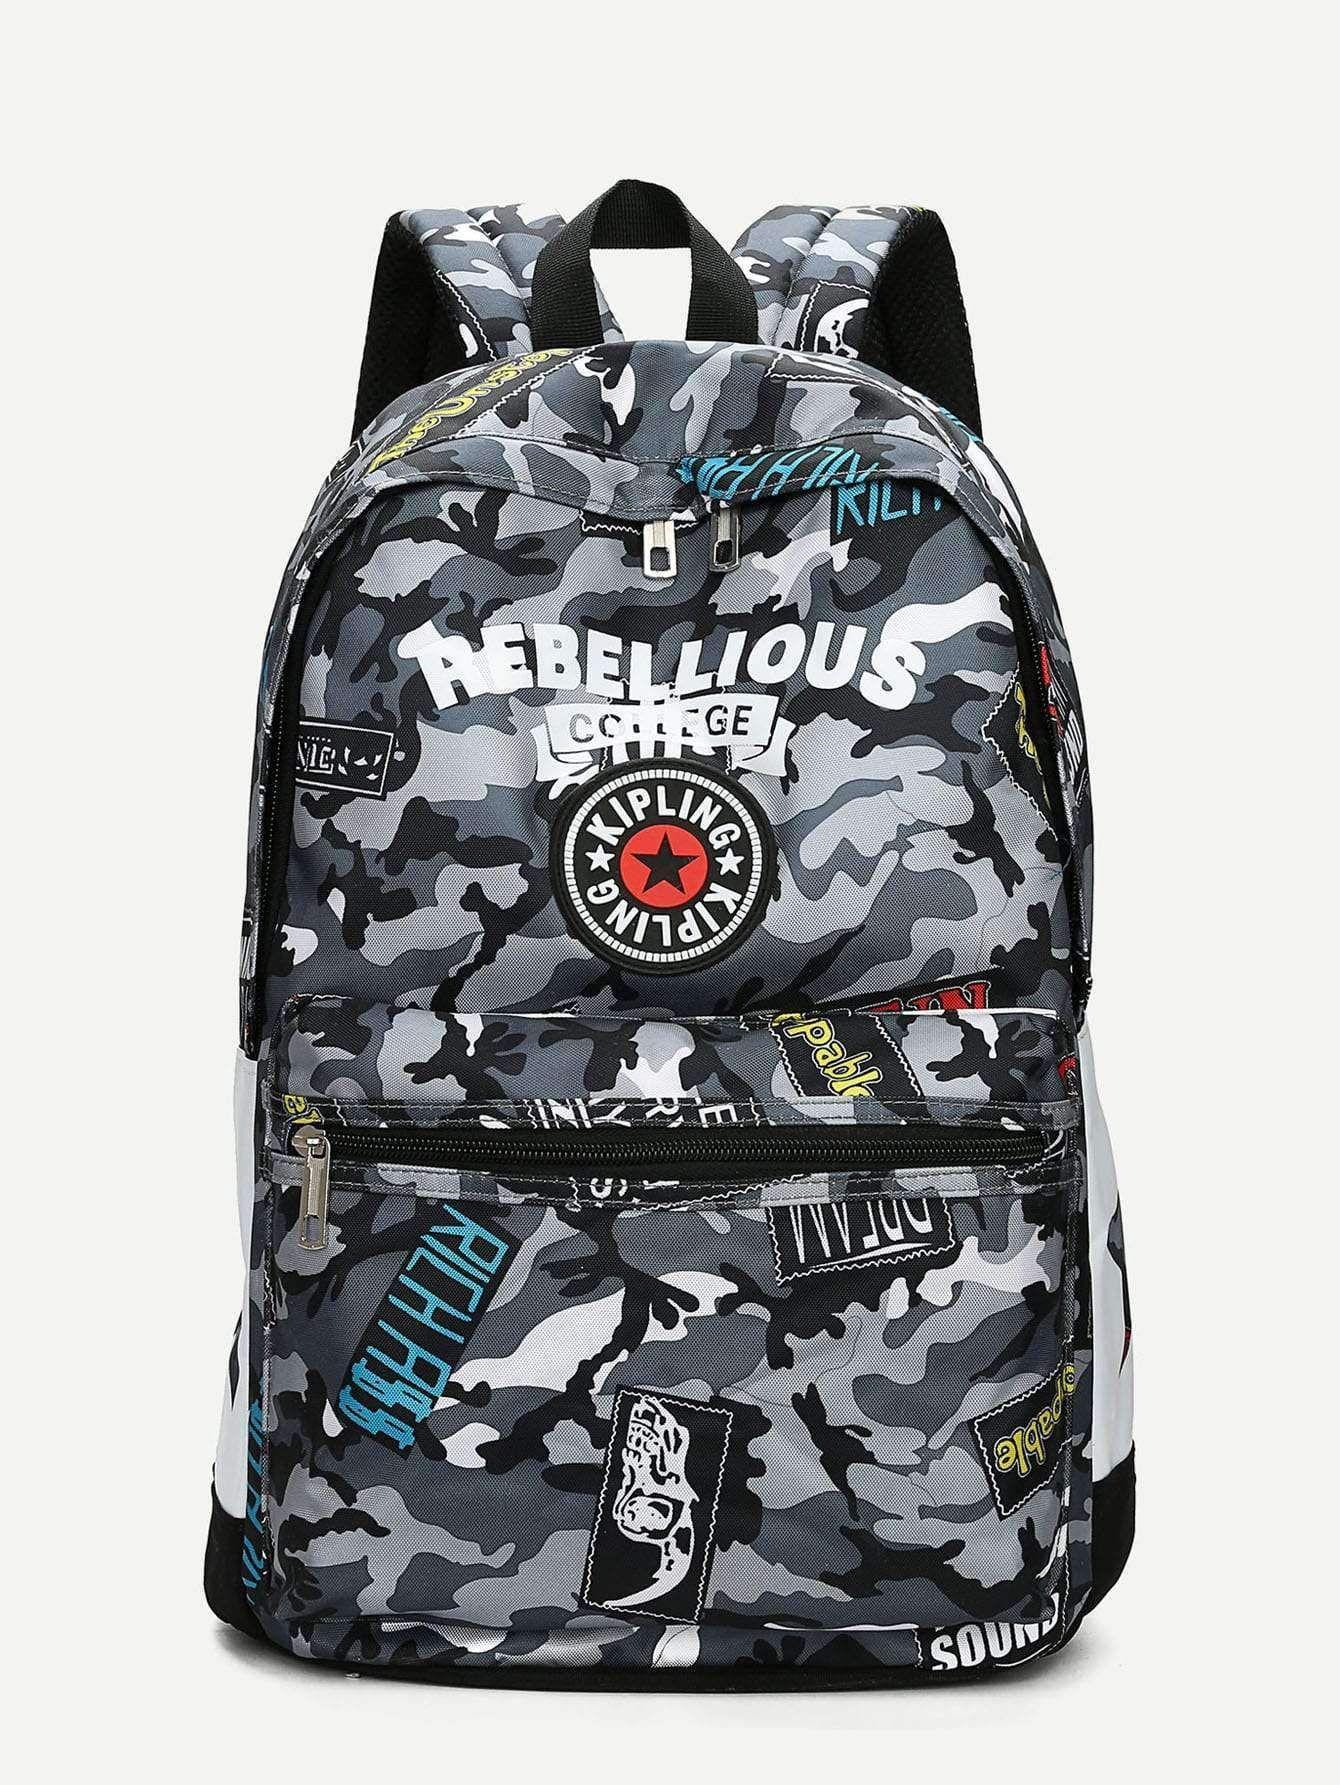 Men Camouflage Letter Print Backpack  #wheretobuy #mensbackpacks #childrensbackpack #ospreybackpacks #motorcyclebackpack #leatherbackpack #backpackshop #daypack #SmallBackpacks #backpack